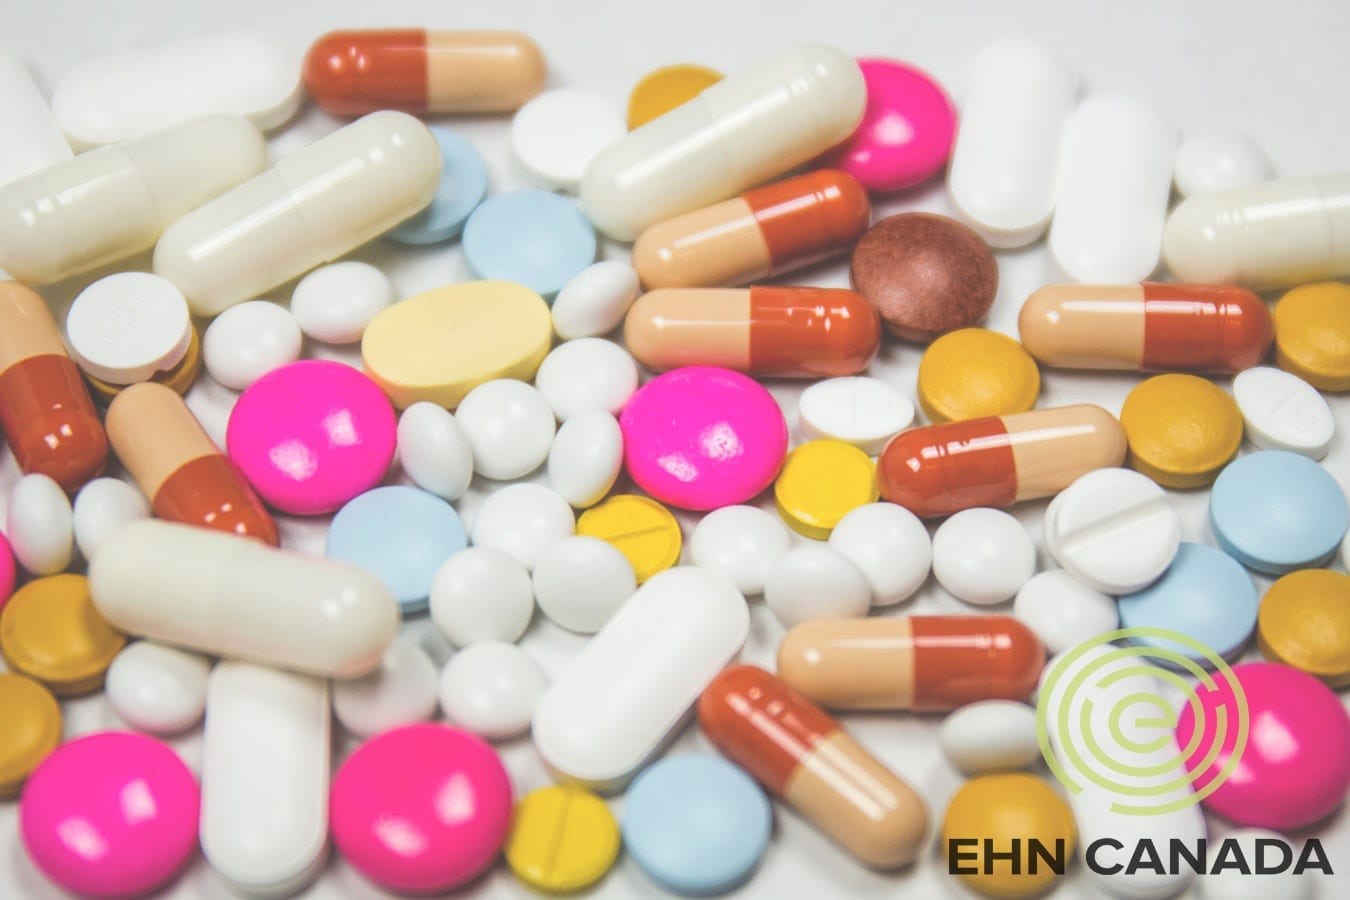 The Opioid Crisis Detox and Rehab Addiction Treatment EHN Canada